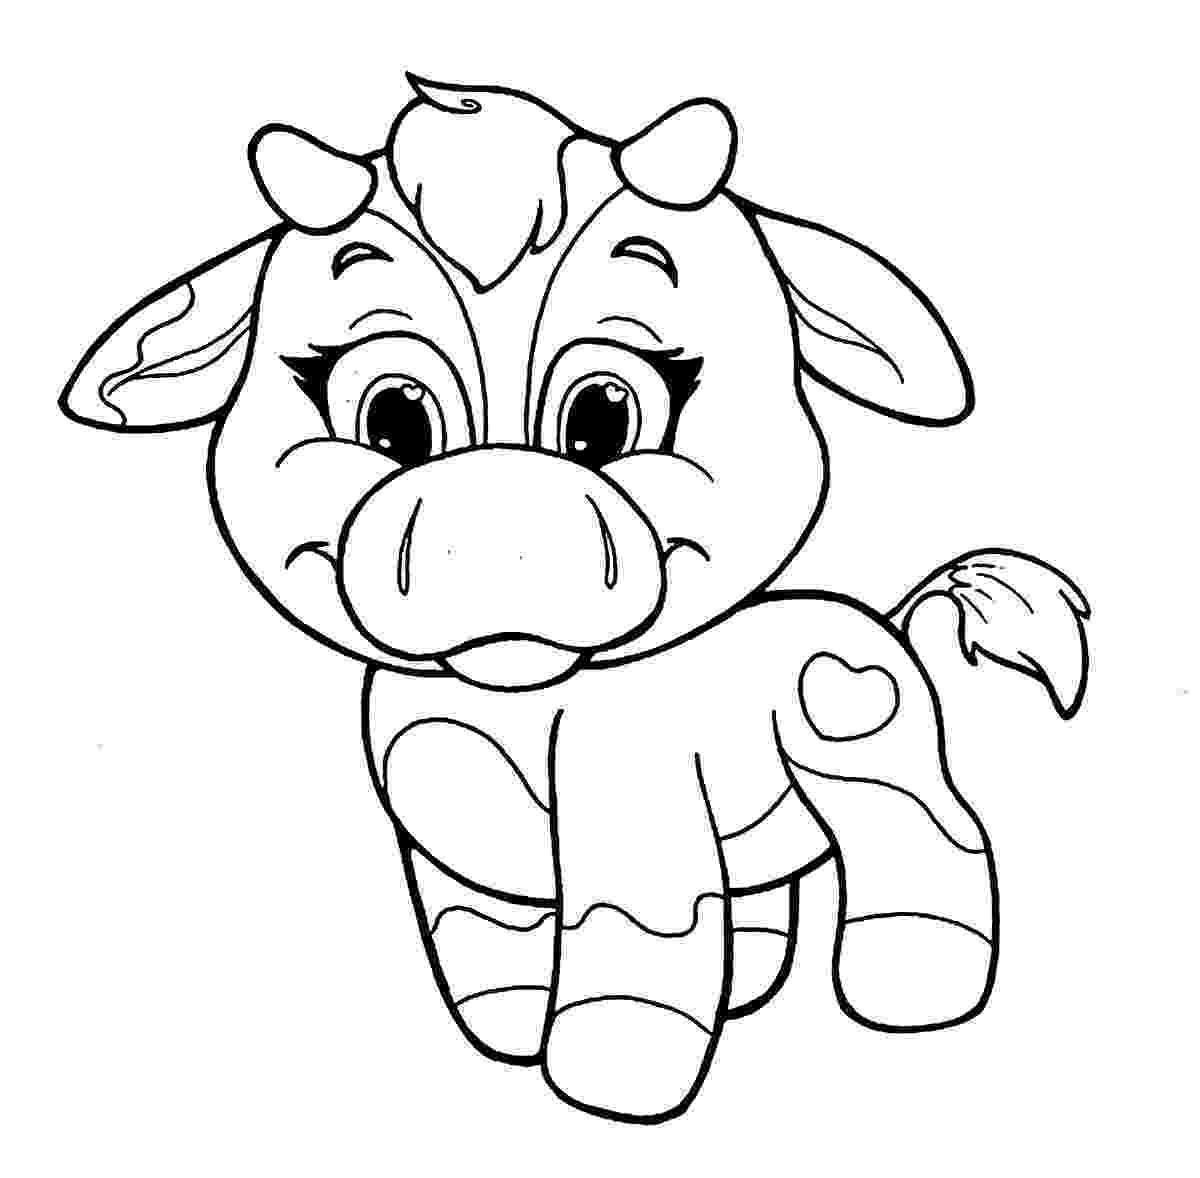 cow pictures to color riscos graciosos cute drawings riscos de vaquinhas cows cow to color pictures